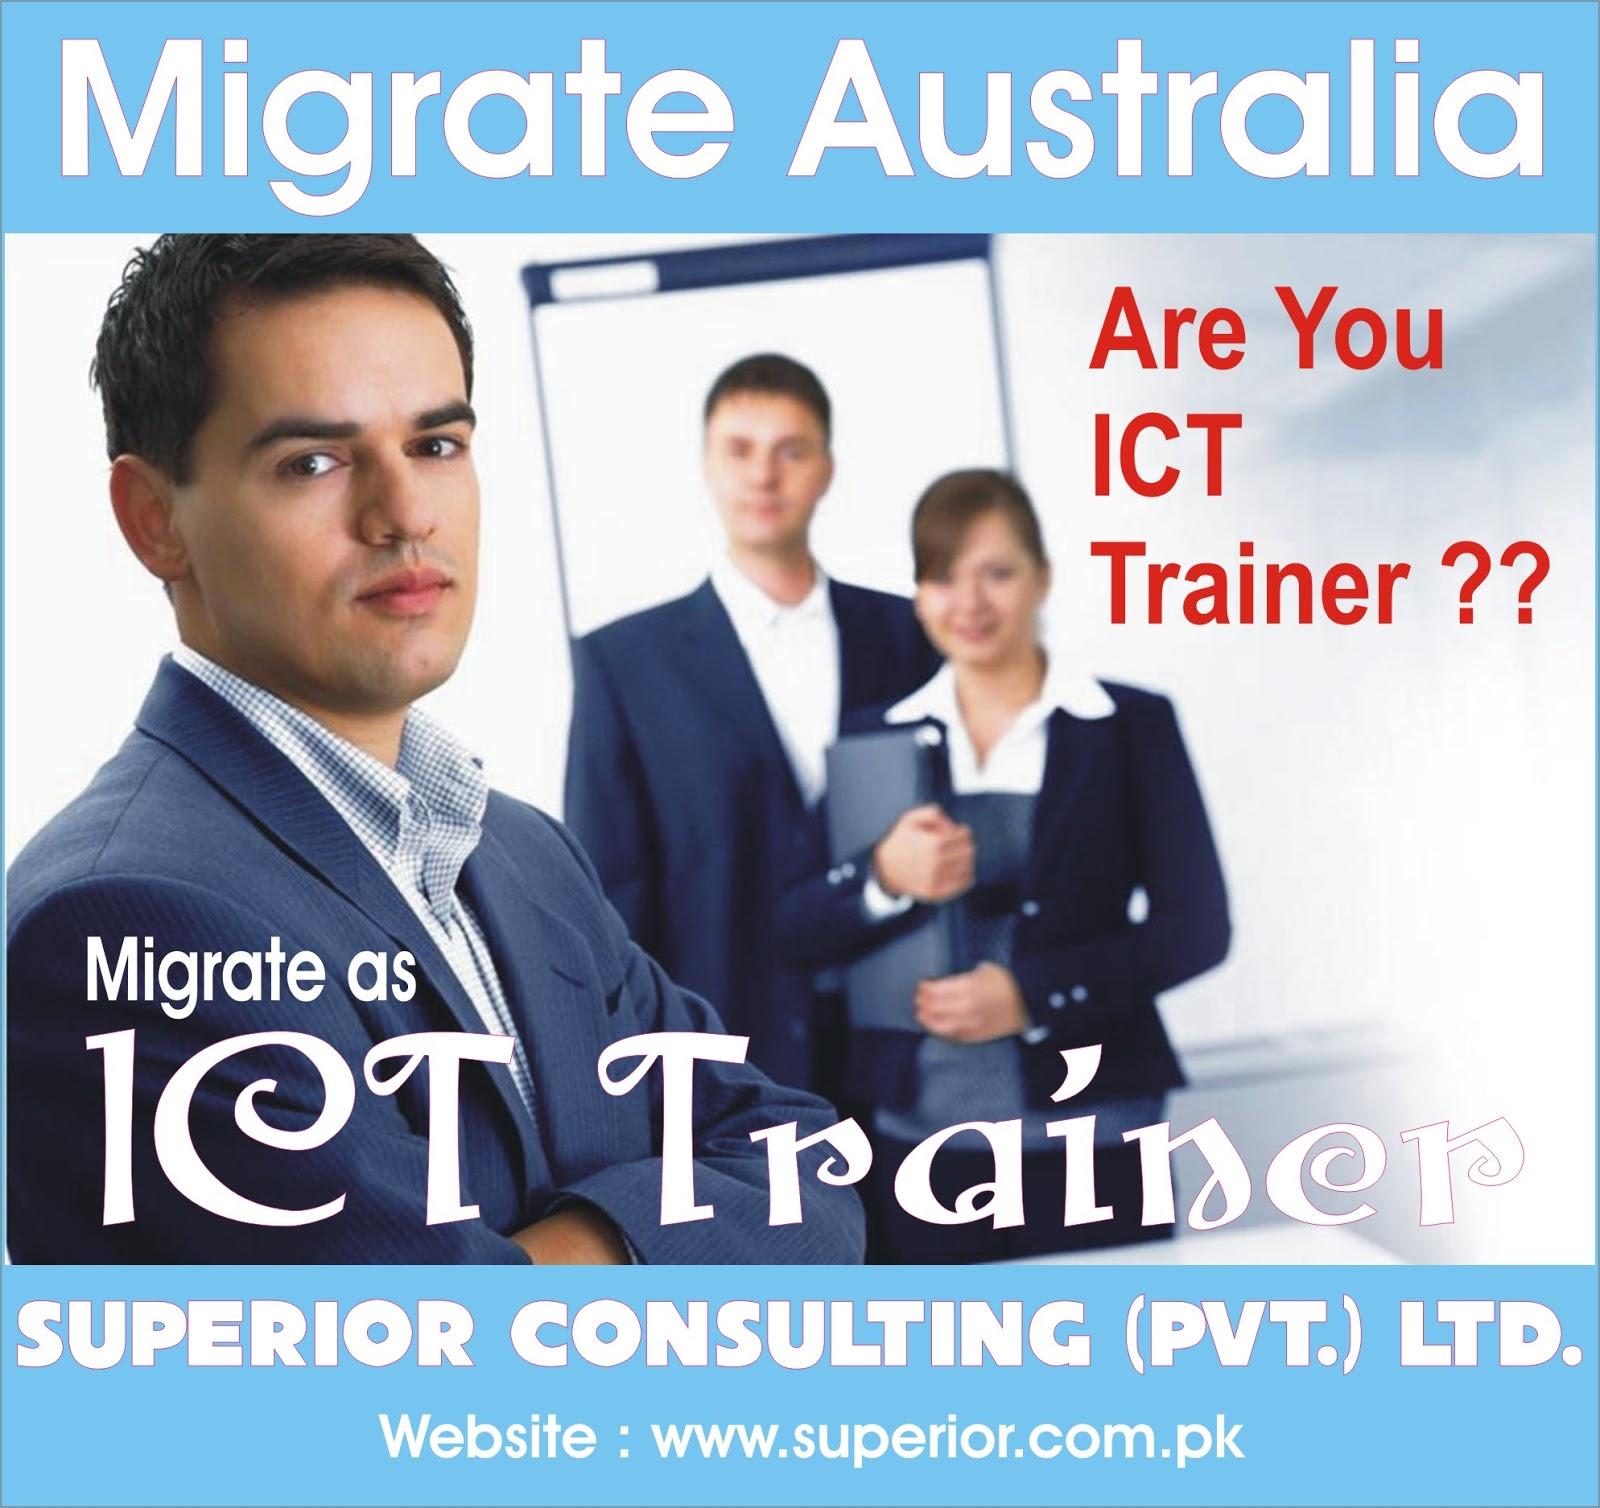 Superior Consulting (Pvt.) Ltd.: Are You ICT Trainer